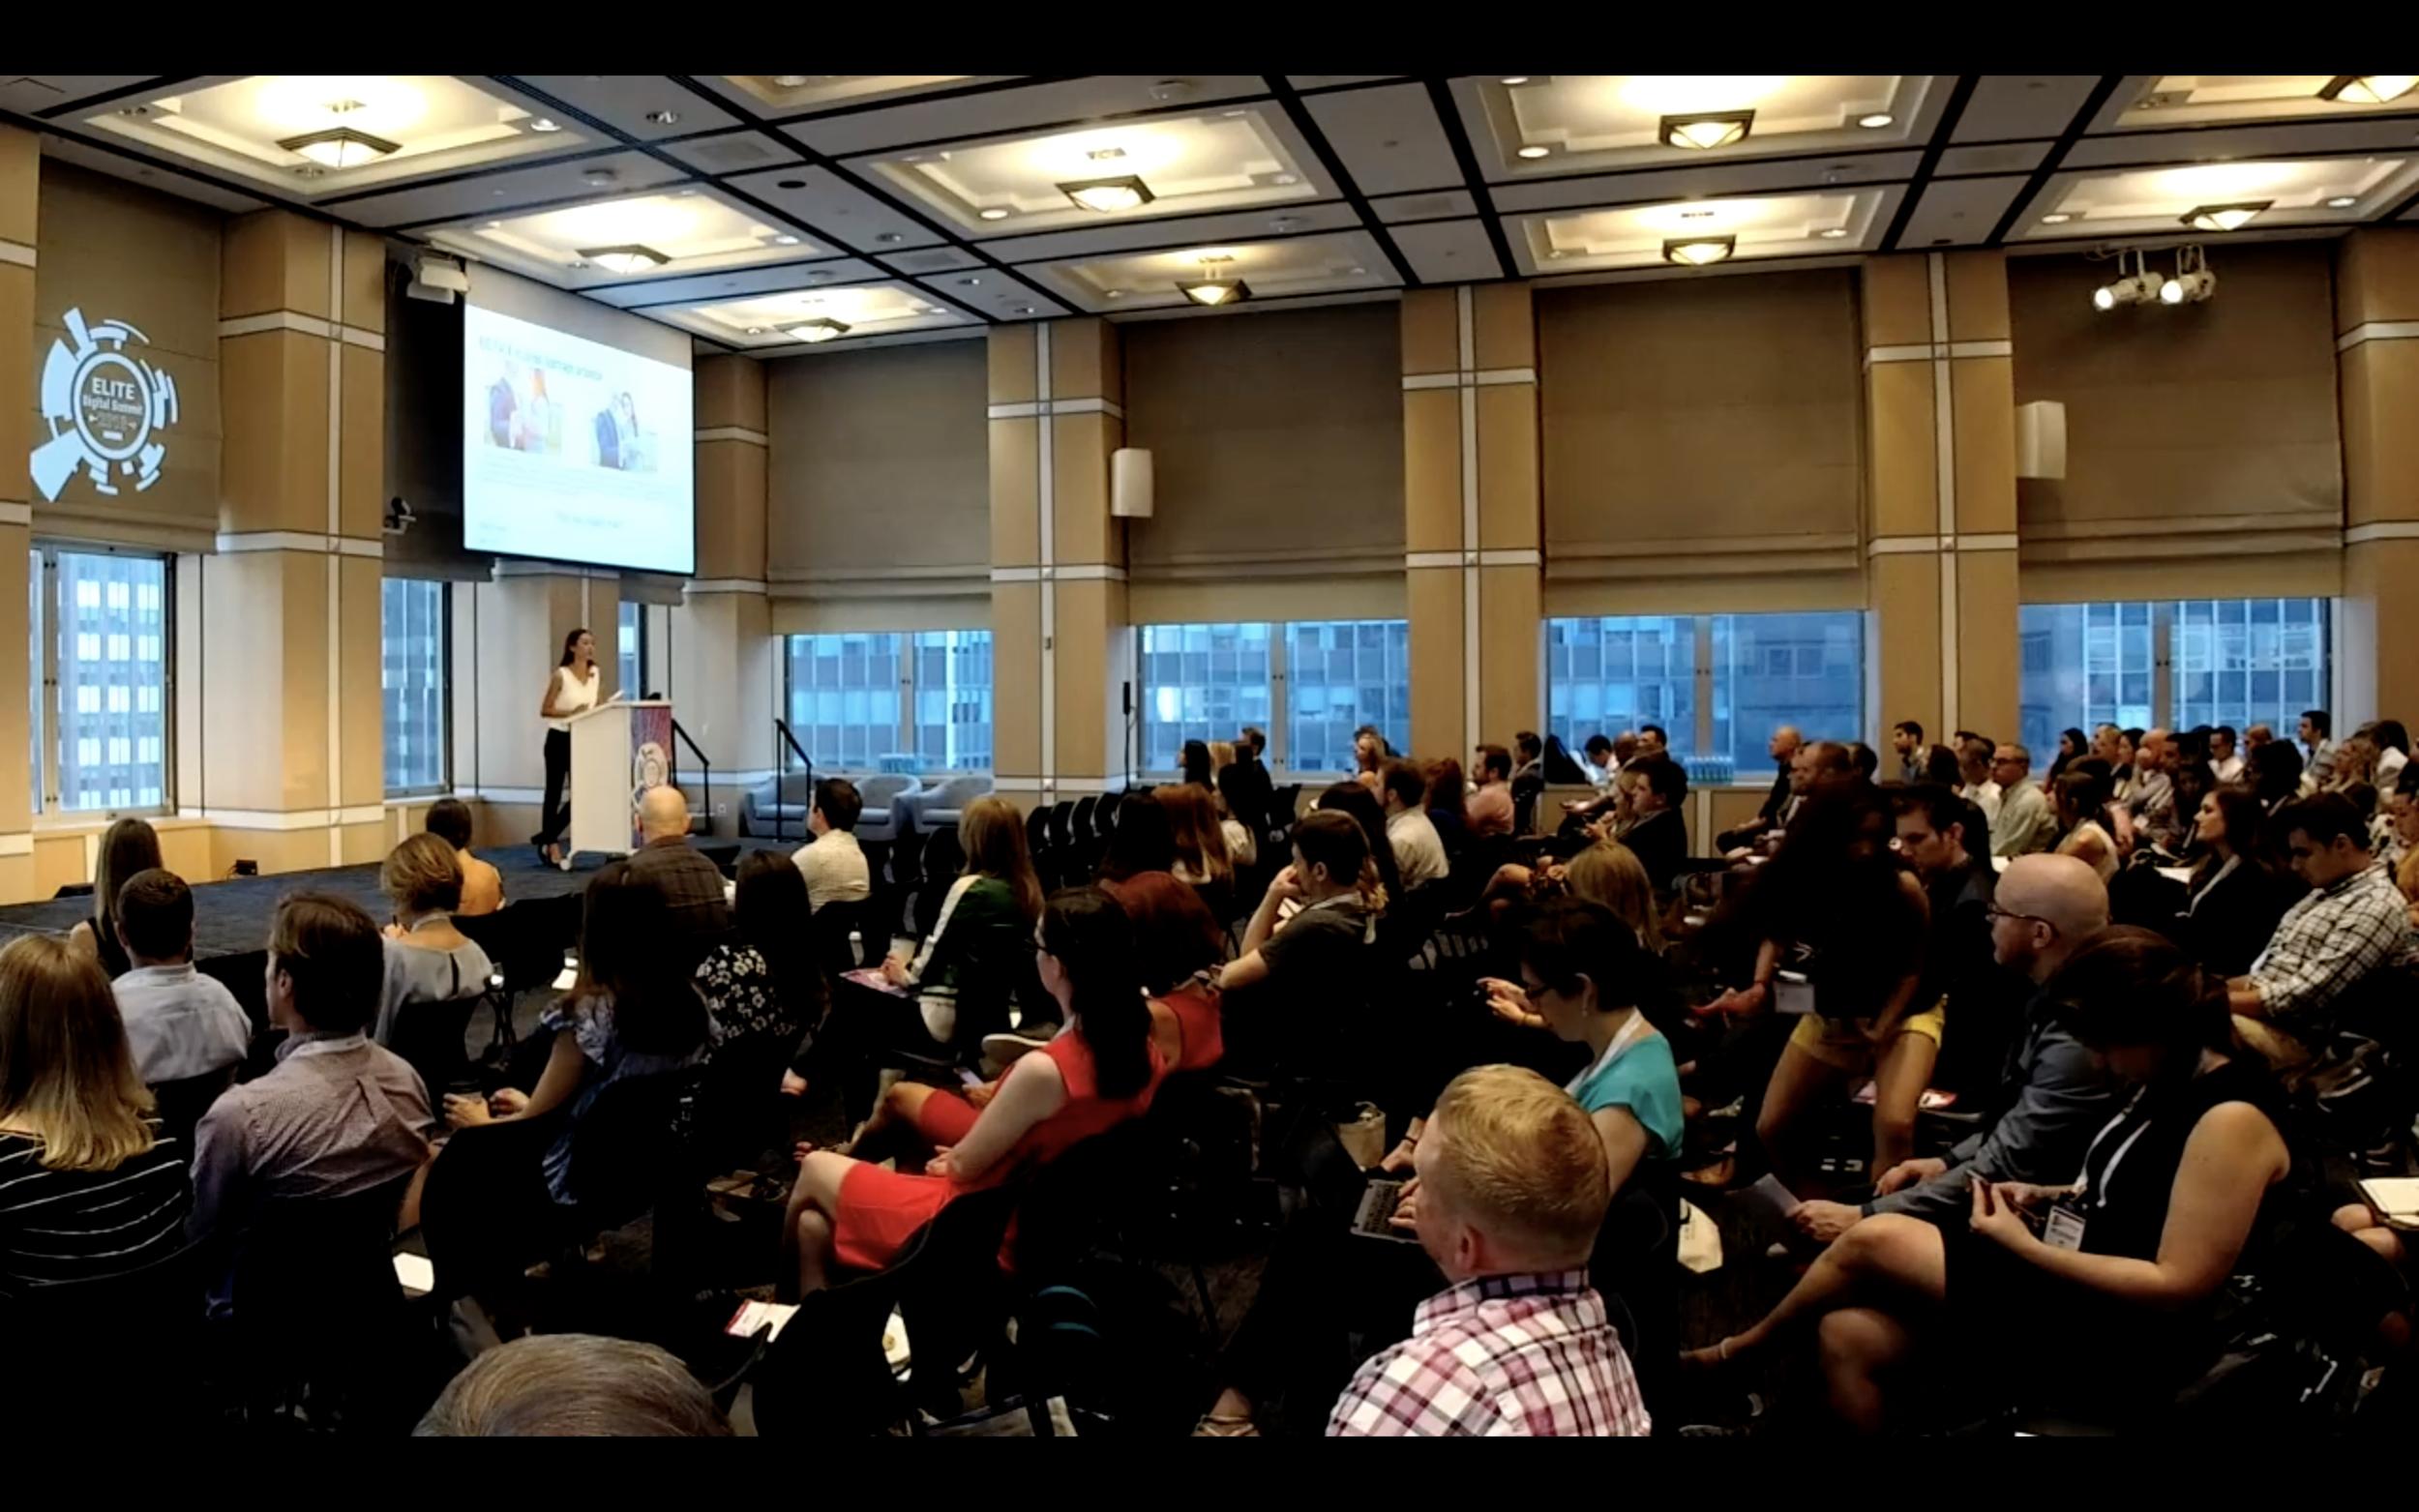 9/6/18 Speaking for Elite SEM Digital Summit 2018.